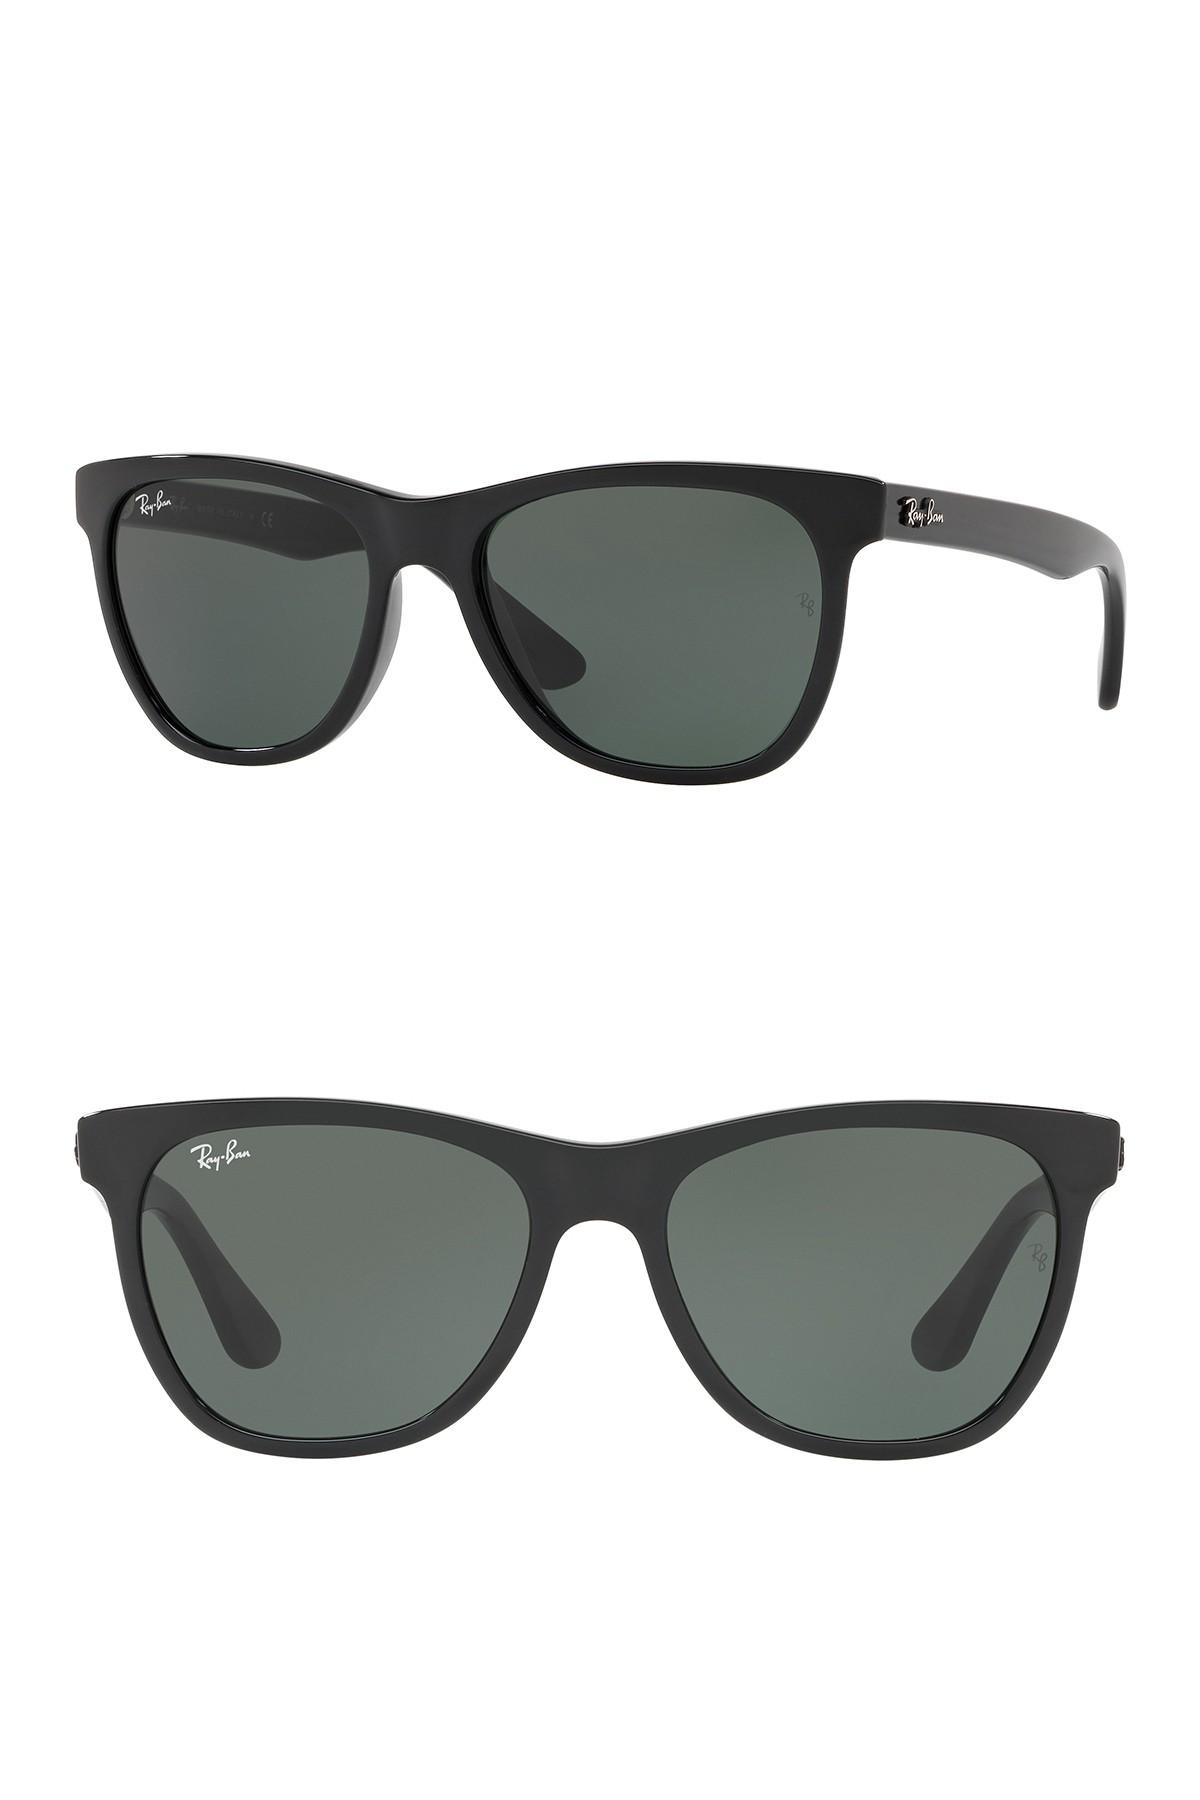 Ray Ban 54mm Wayfarer Sunglasses Nordstrom Rack Wayfarer Sunglasses Ray Ban Sunglasses Wayfarer Rayban Wayfarer